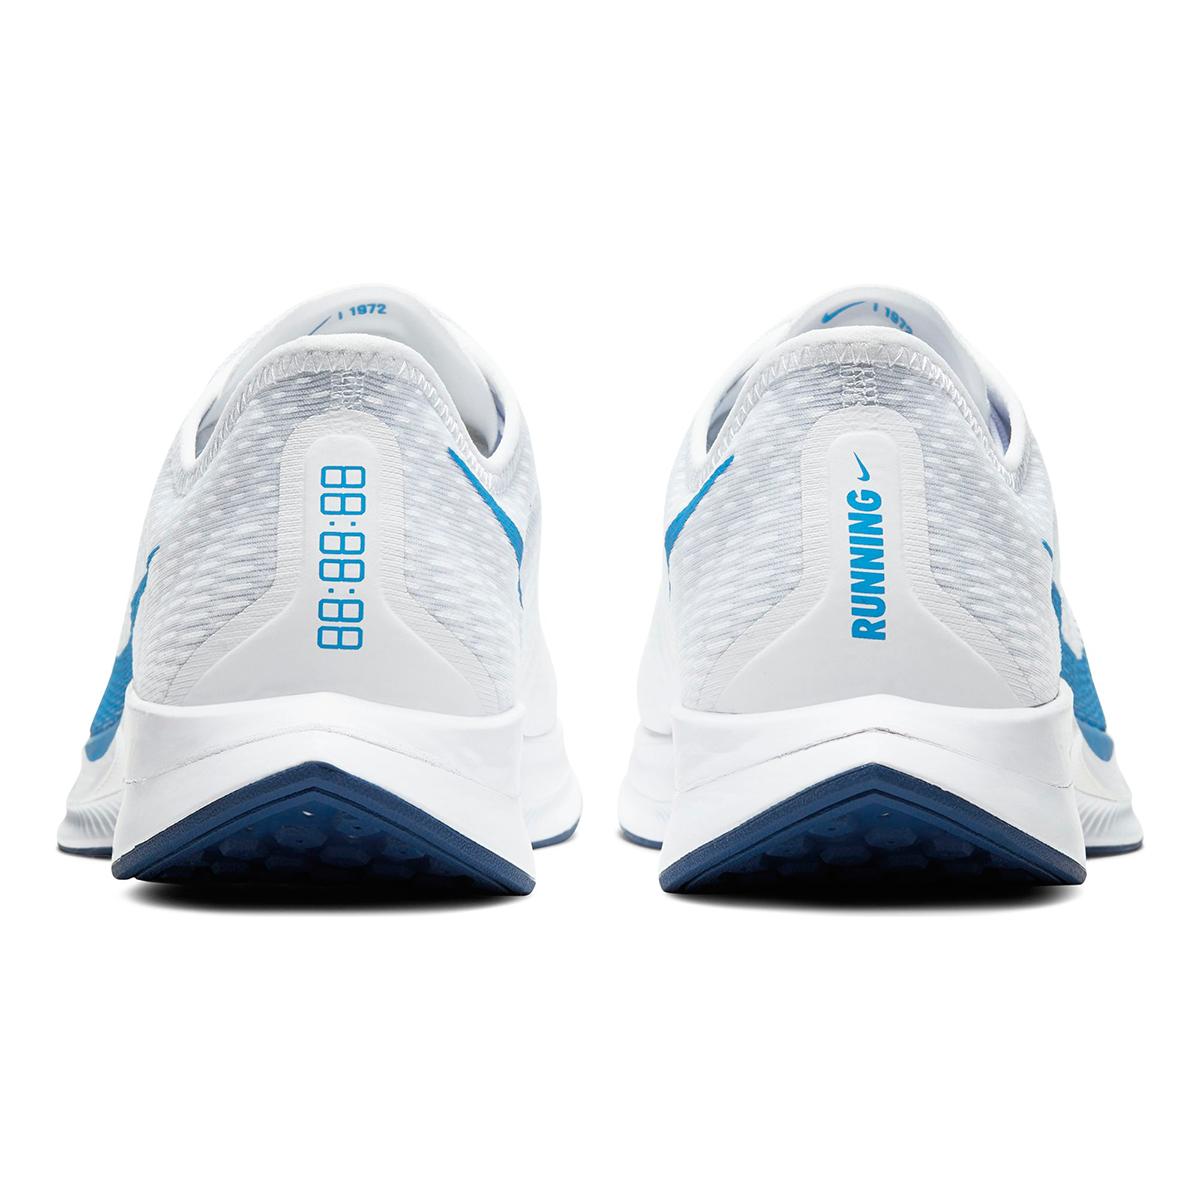 Men's Nike Zoom Pegasus Turbo 2 Running Shoe - Color: White/Blue Void/Football Grey/Photo Blue (Regular Width) - Size: 6, White/Blue Void/Football Grey/Photo Blue, large, image 3